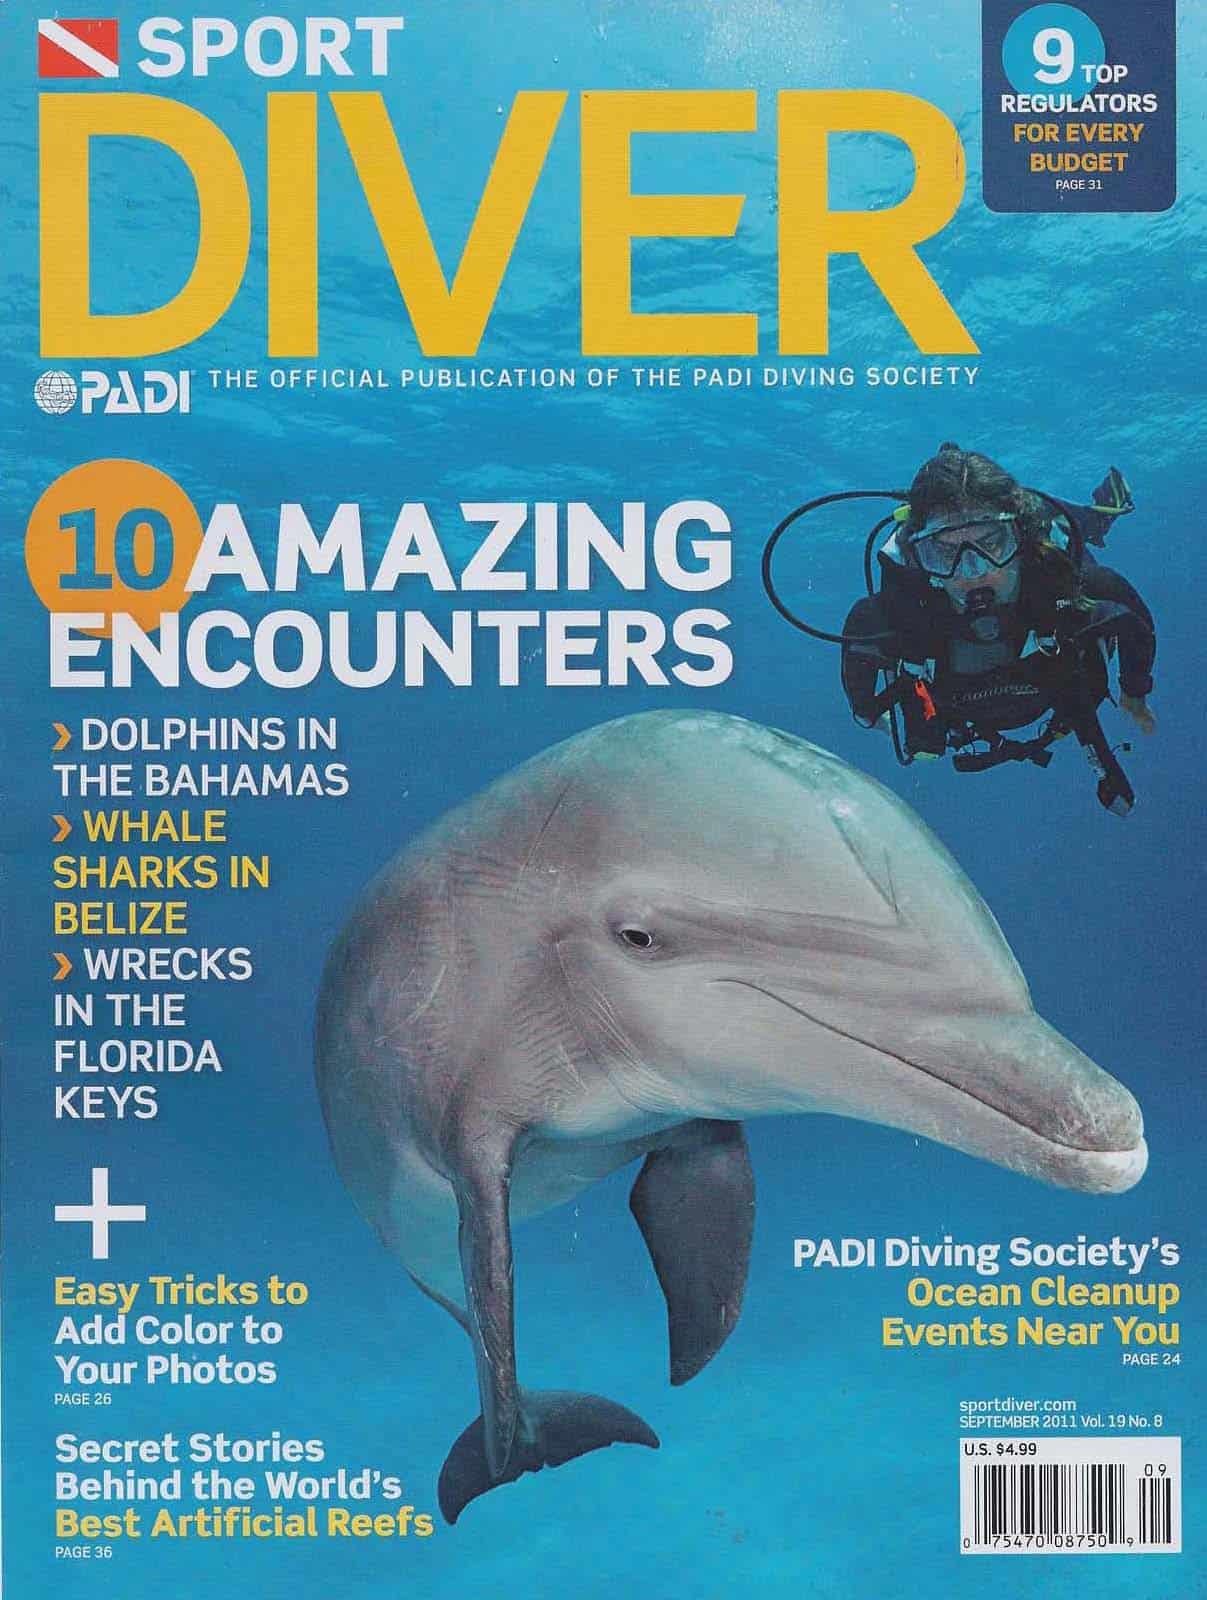 Belize Ecotourism at Hamanasi Belize Resort covered by Sport Diver magazine